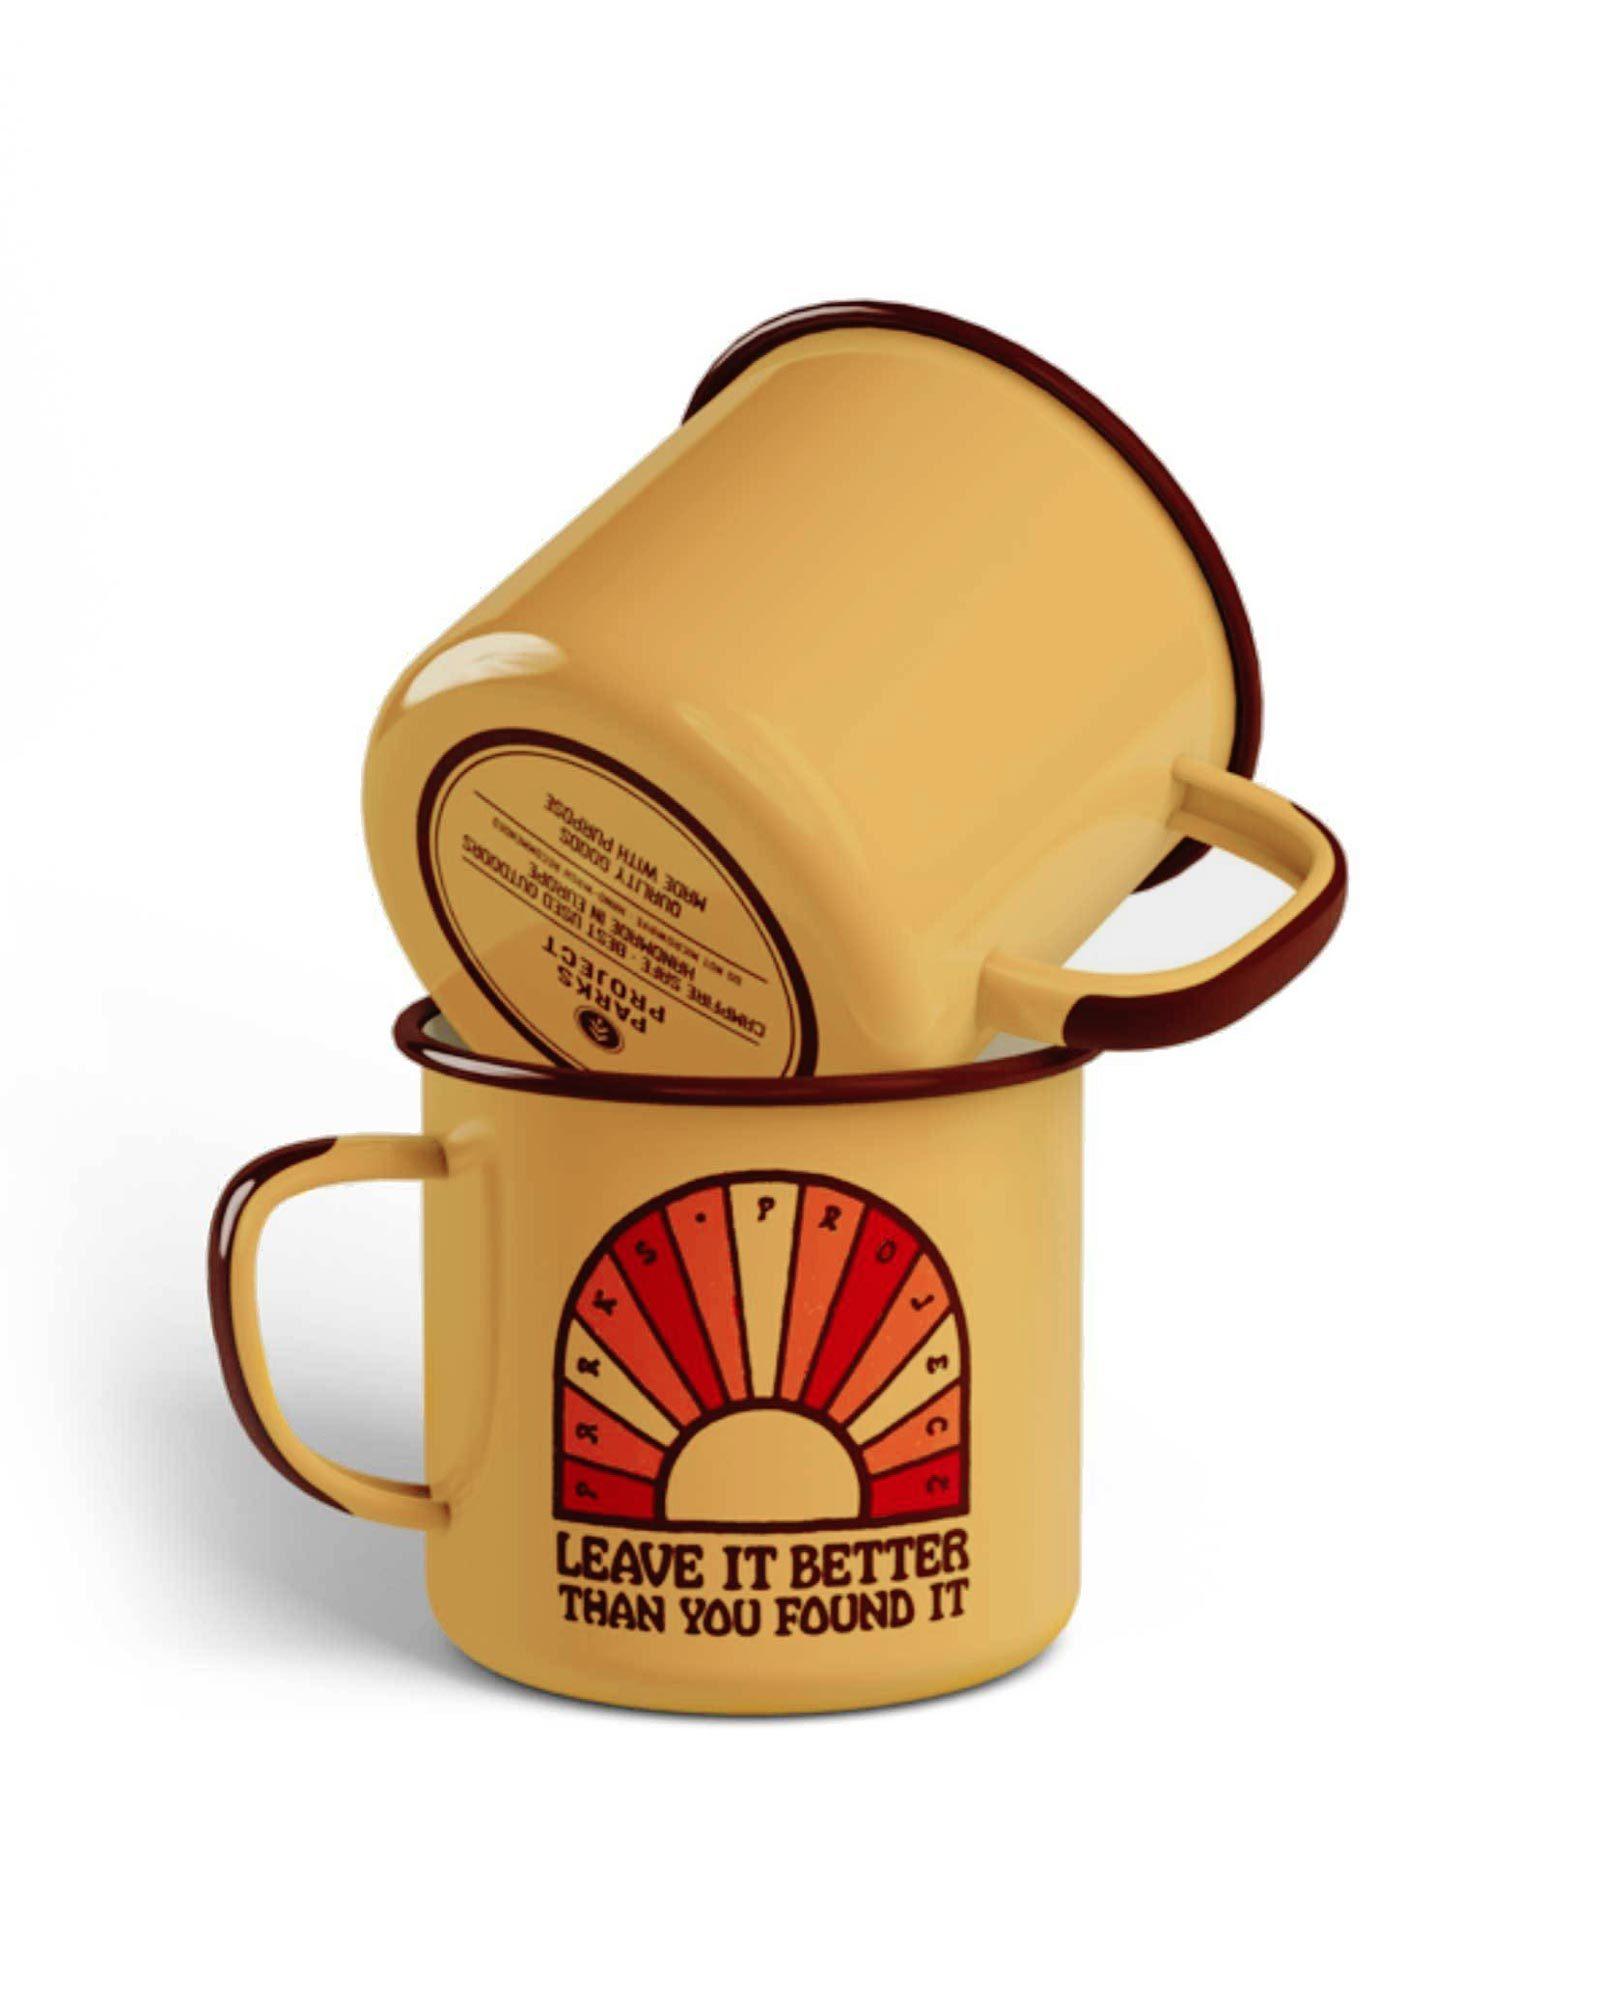 Leave It Better Enamel Mug, $15 @parksproject.us